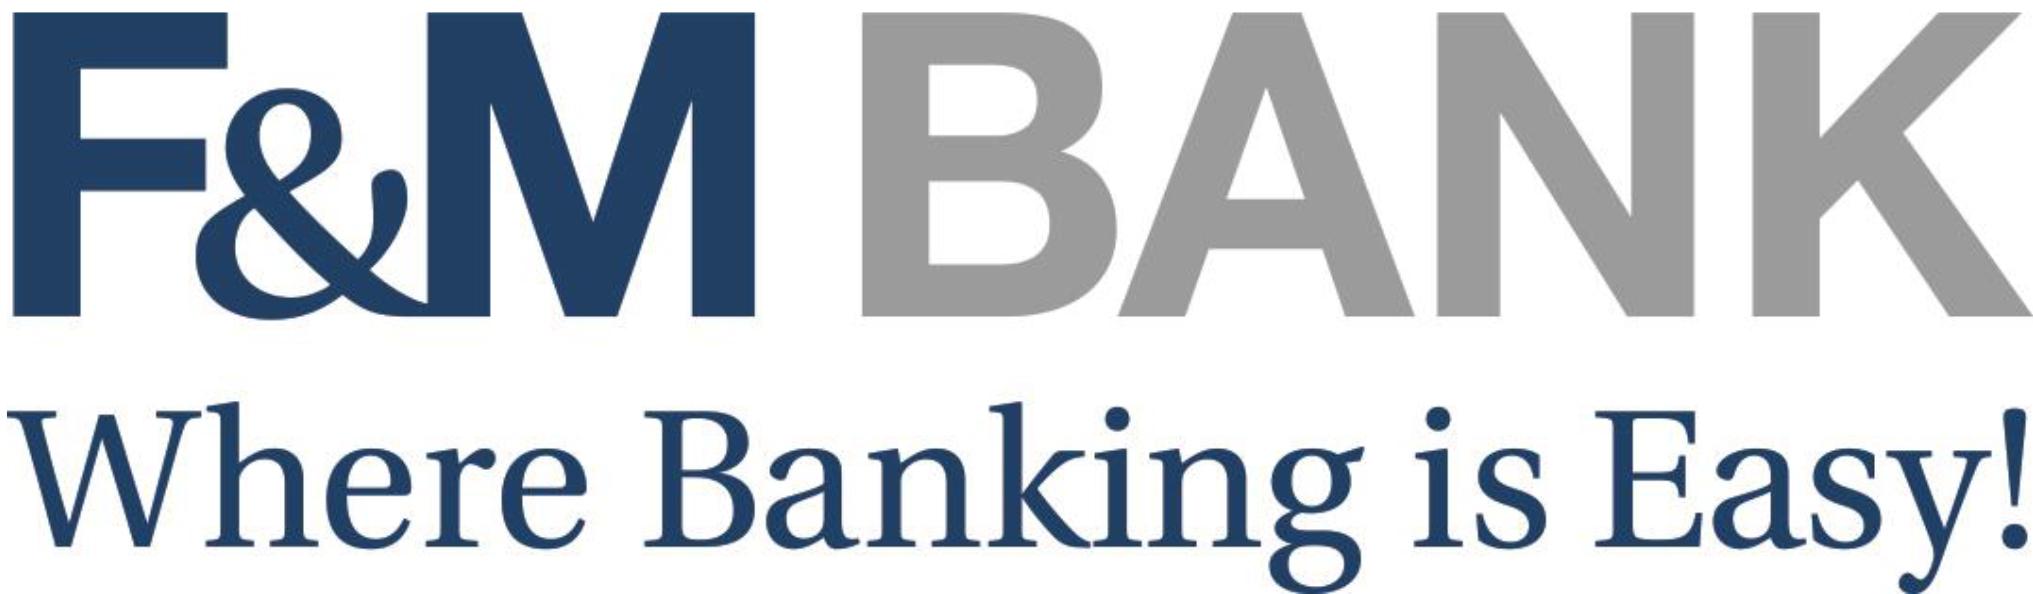 F&M bank logo.jpg